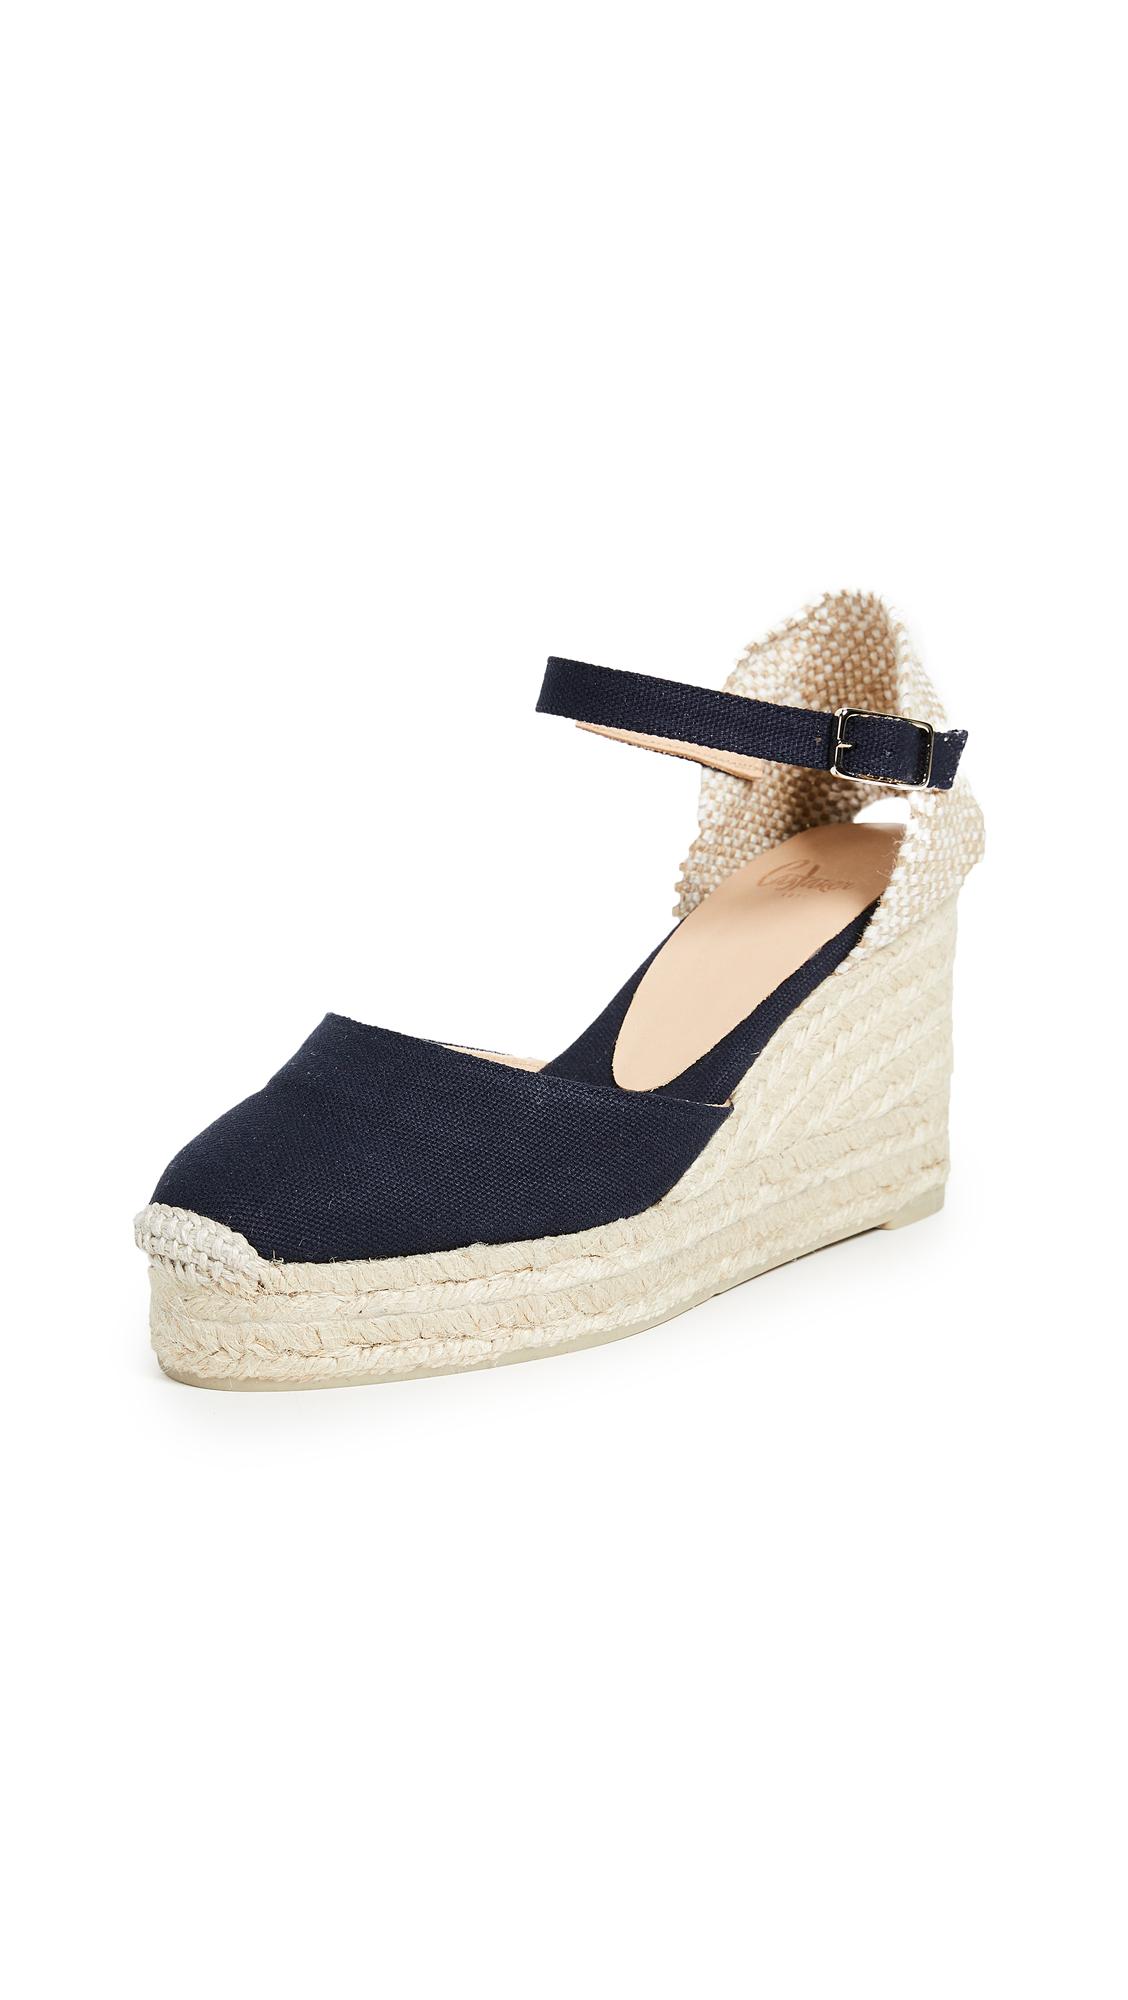 Castaner Carol Ankle Stap Wedges - Azul Marino